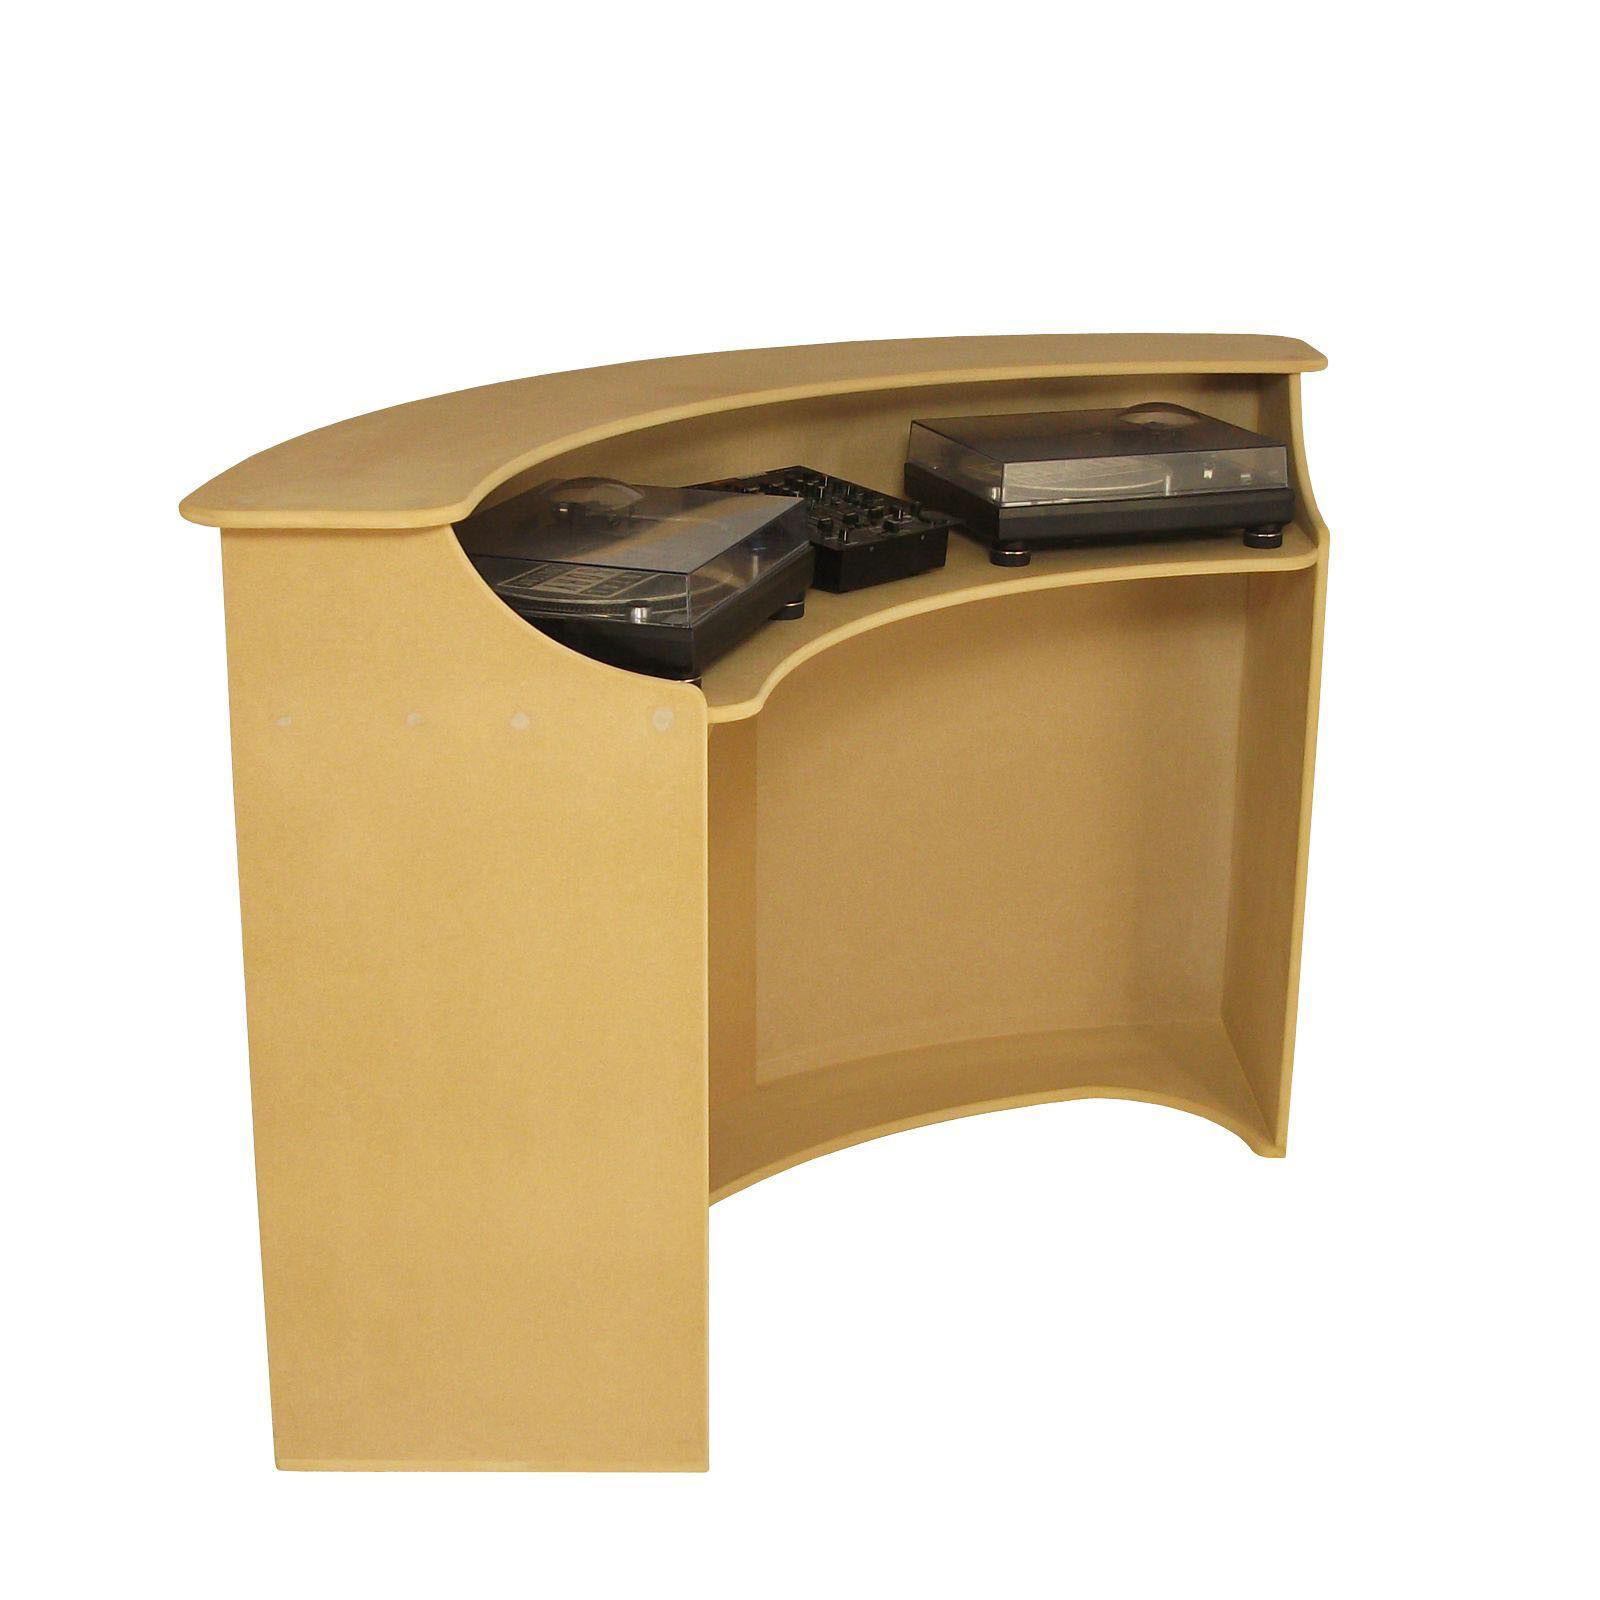 DJ Booth Desk Stand for Decks, CDJ's & Mixer Pubs & Clubs - Sound Desks (DB3)